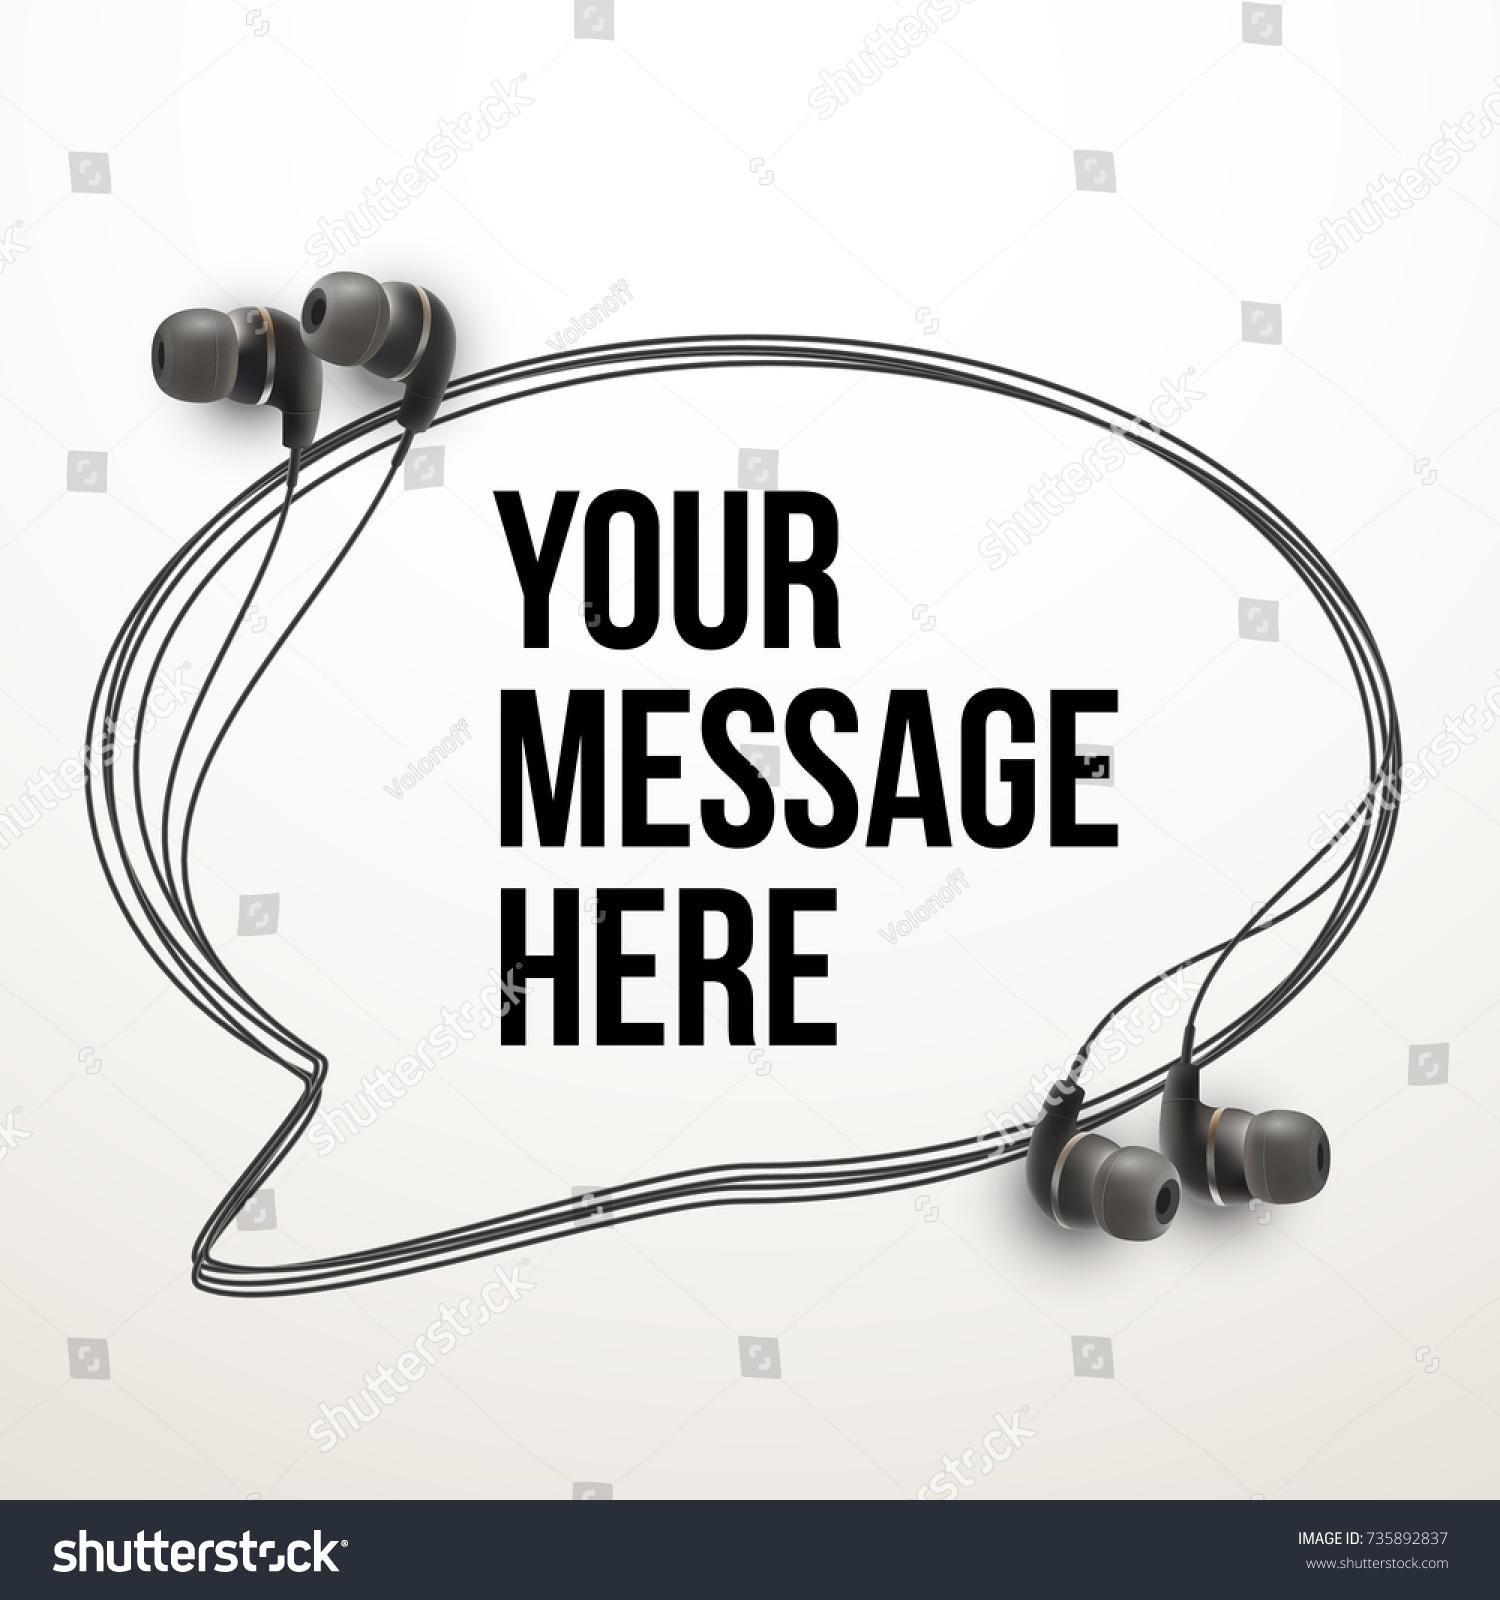 Innovative Vector Music Quotation Template Headphones Stock Photo ...